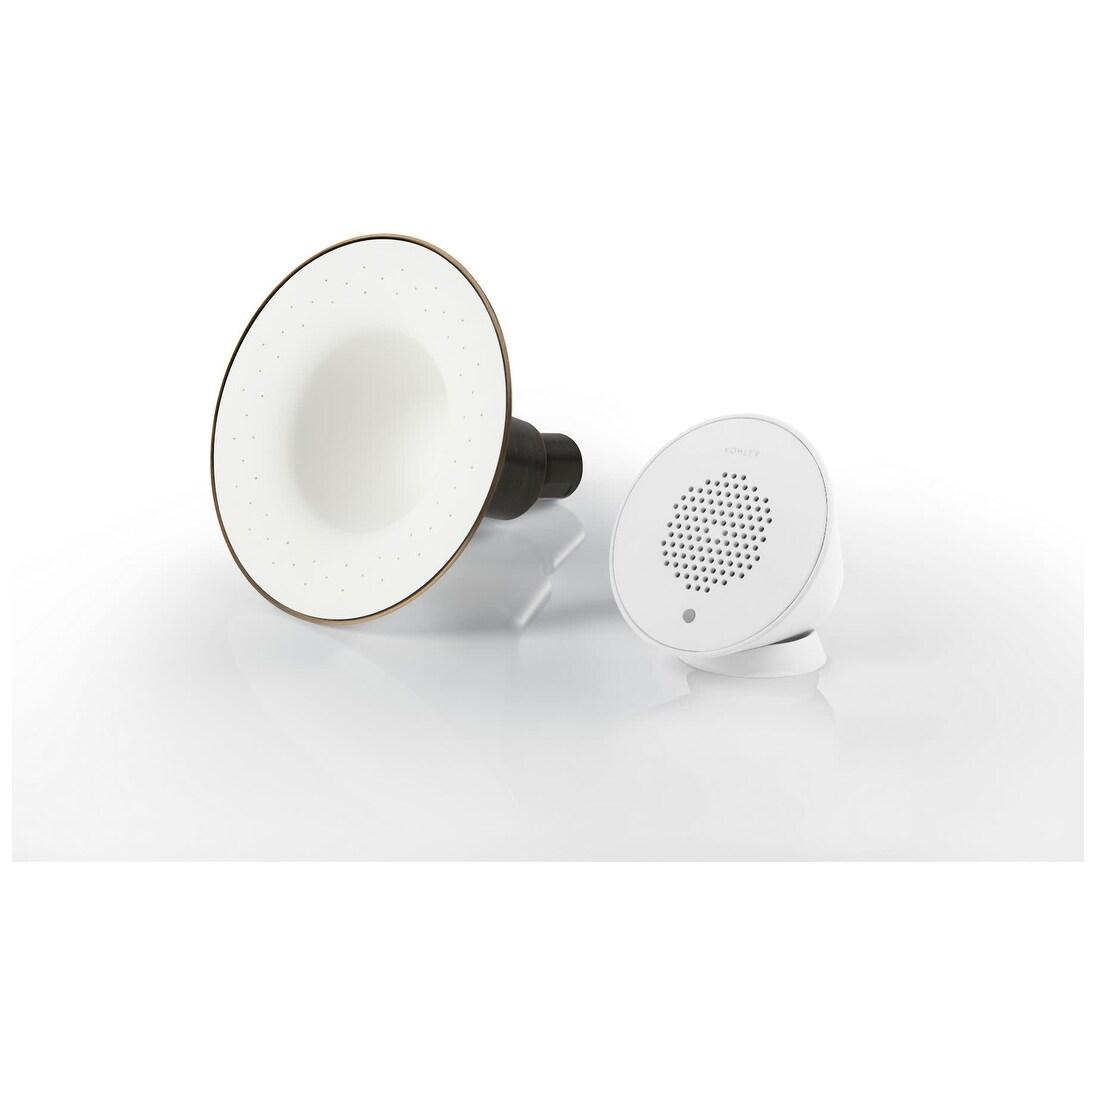 Kohler K 9245 G Moxie 1 75 Gpm Single Function Shower Head With Bluetooth Wireless Technology